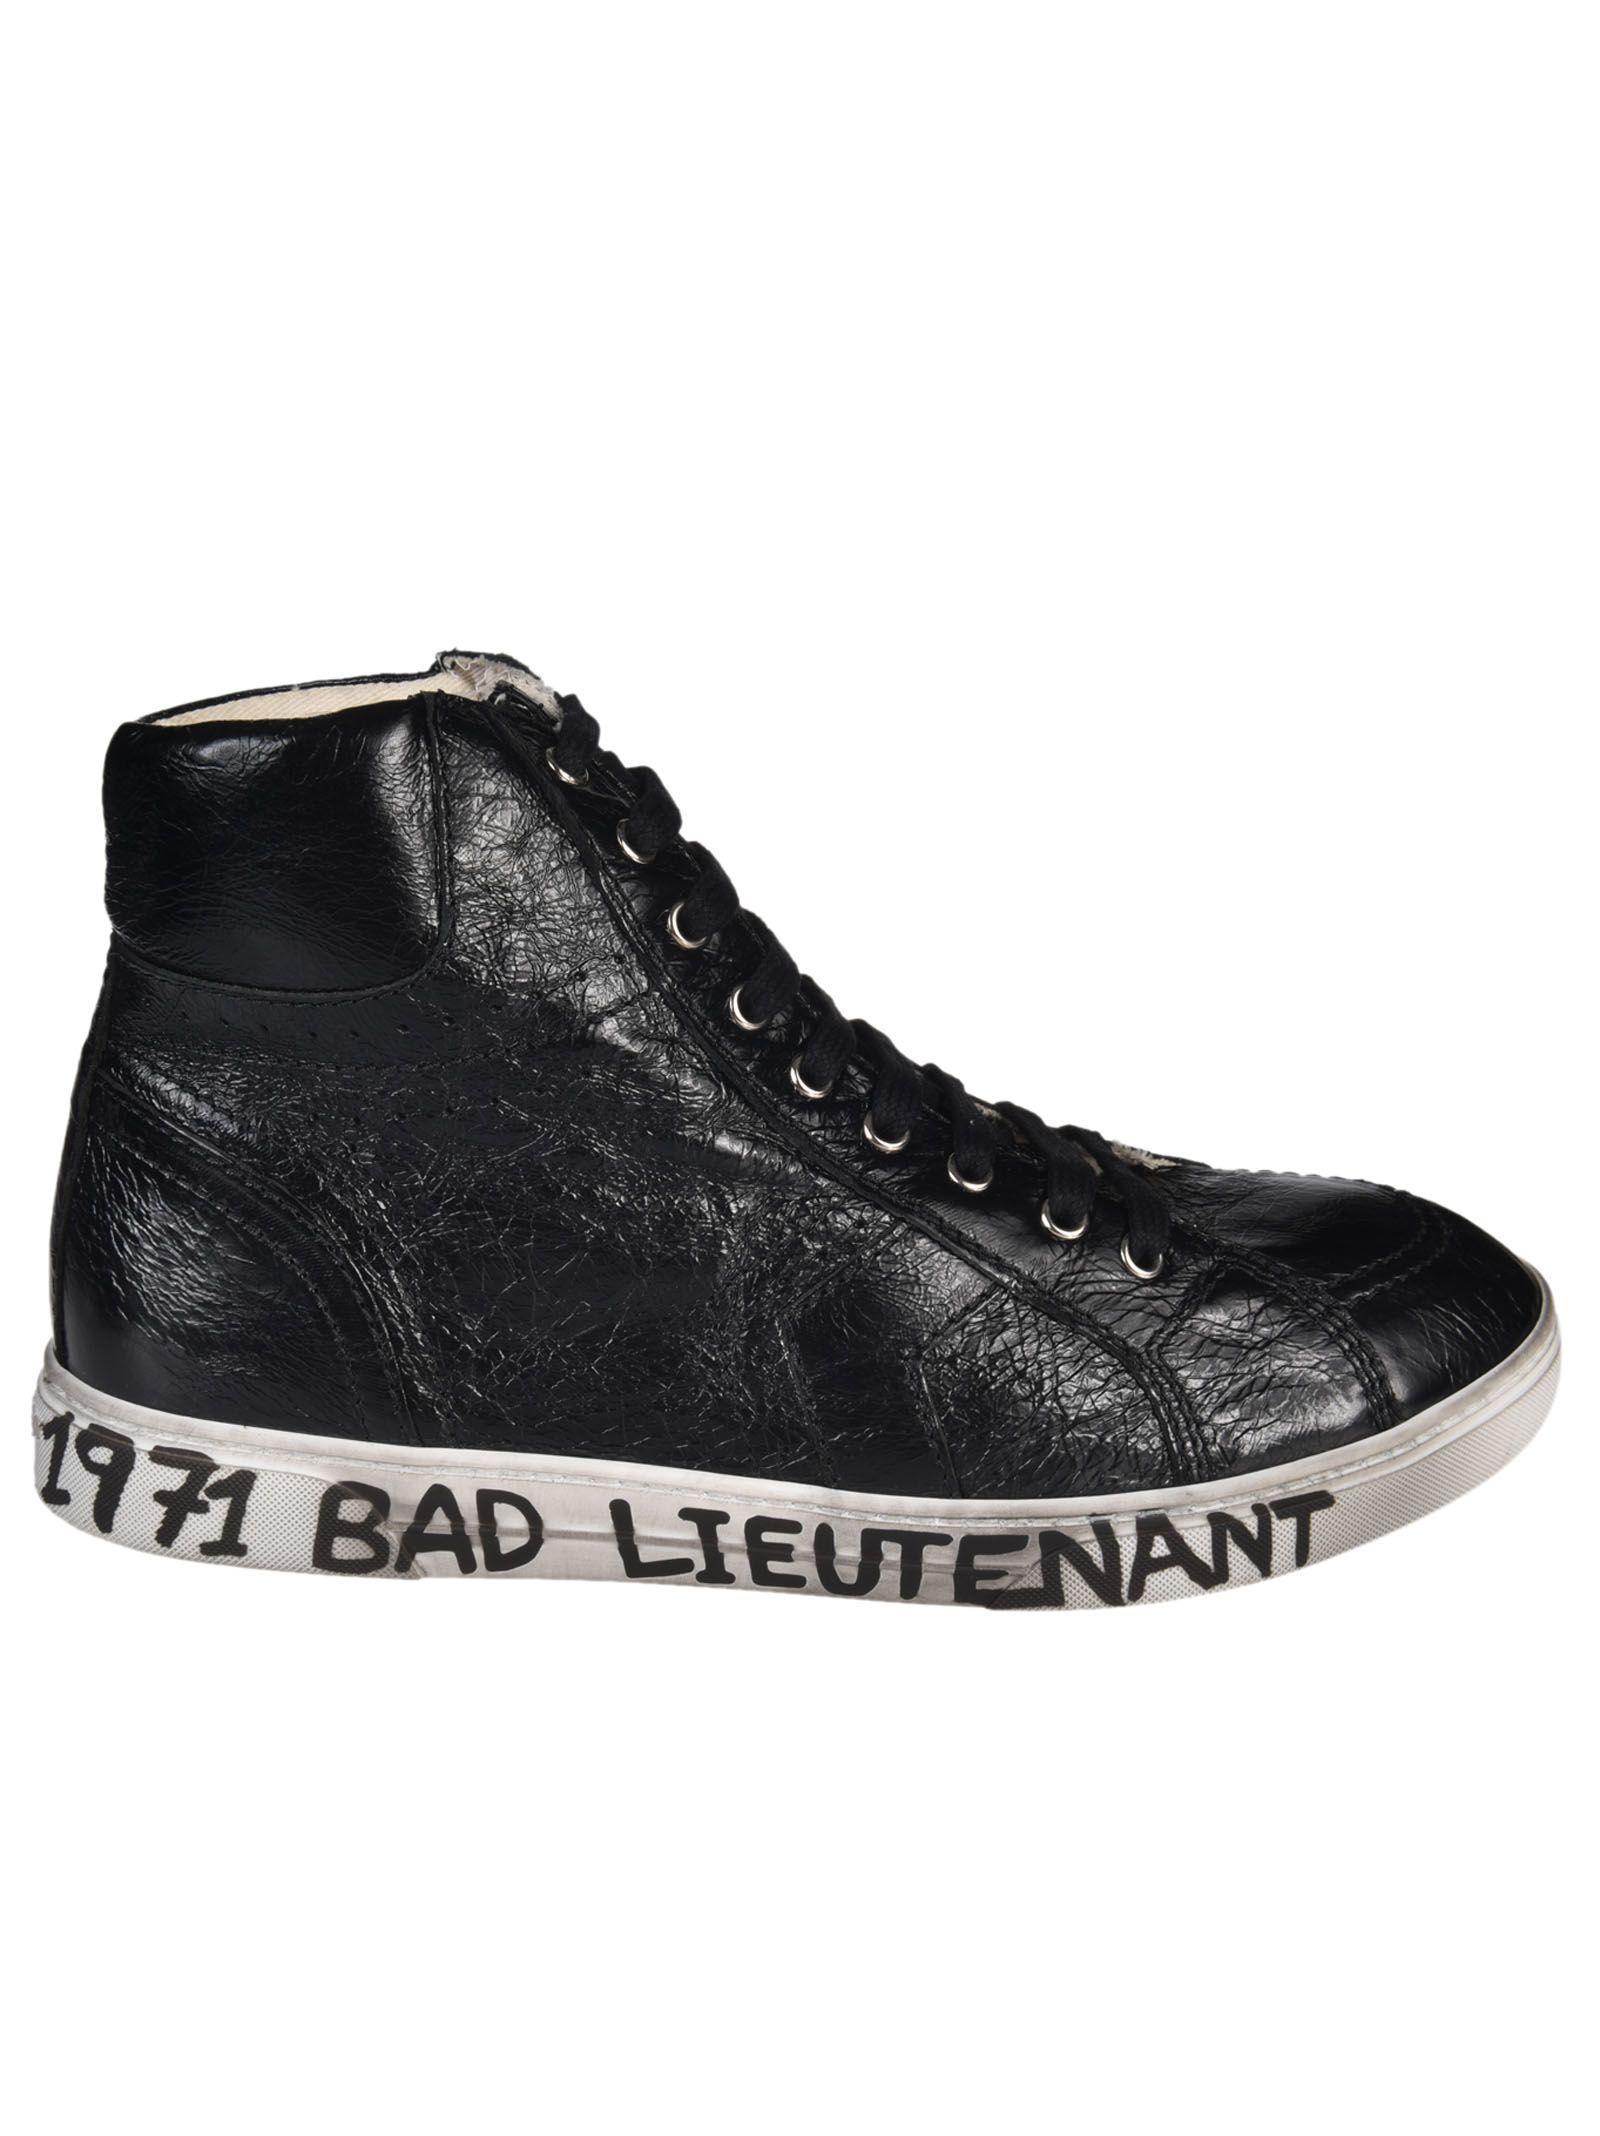 Saint Laurent Joe Mid Top Sneakers